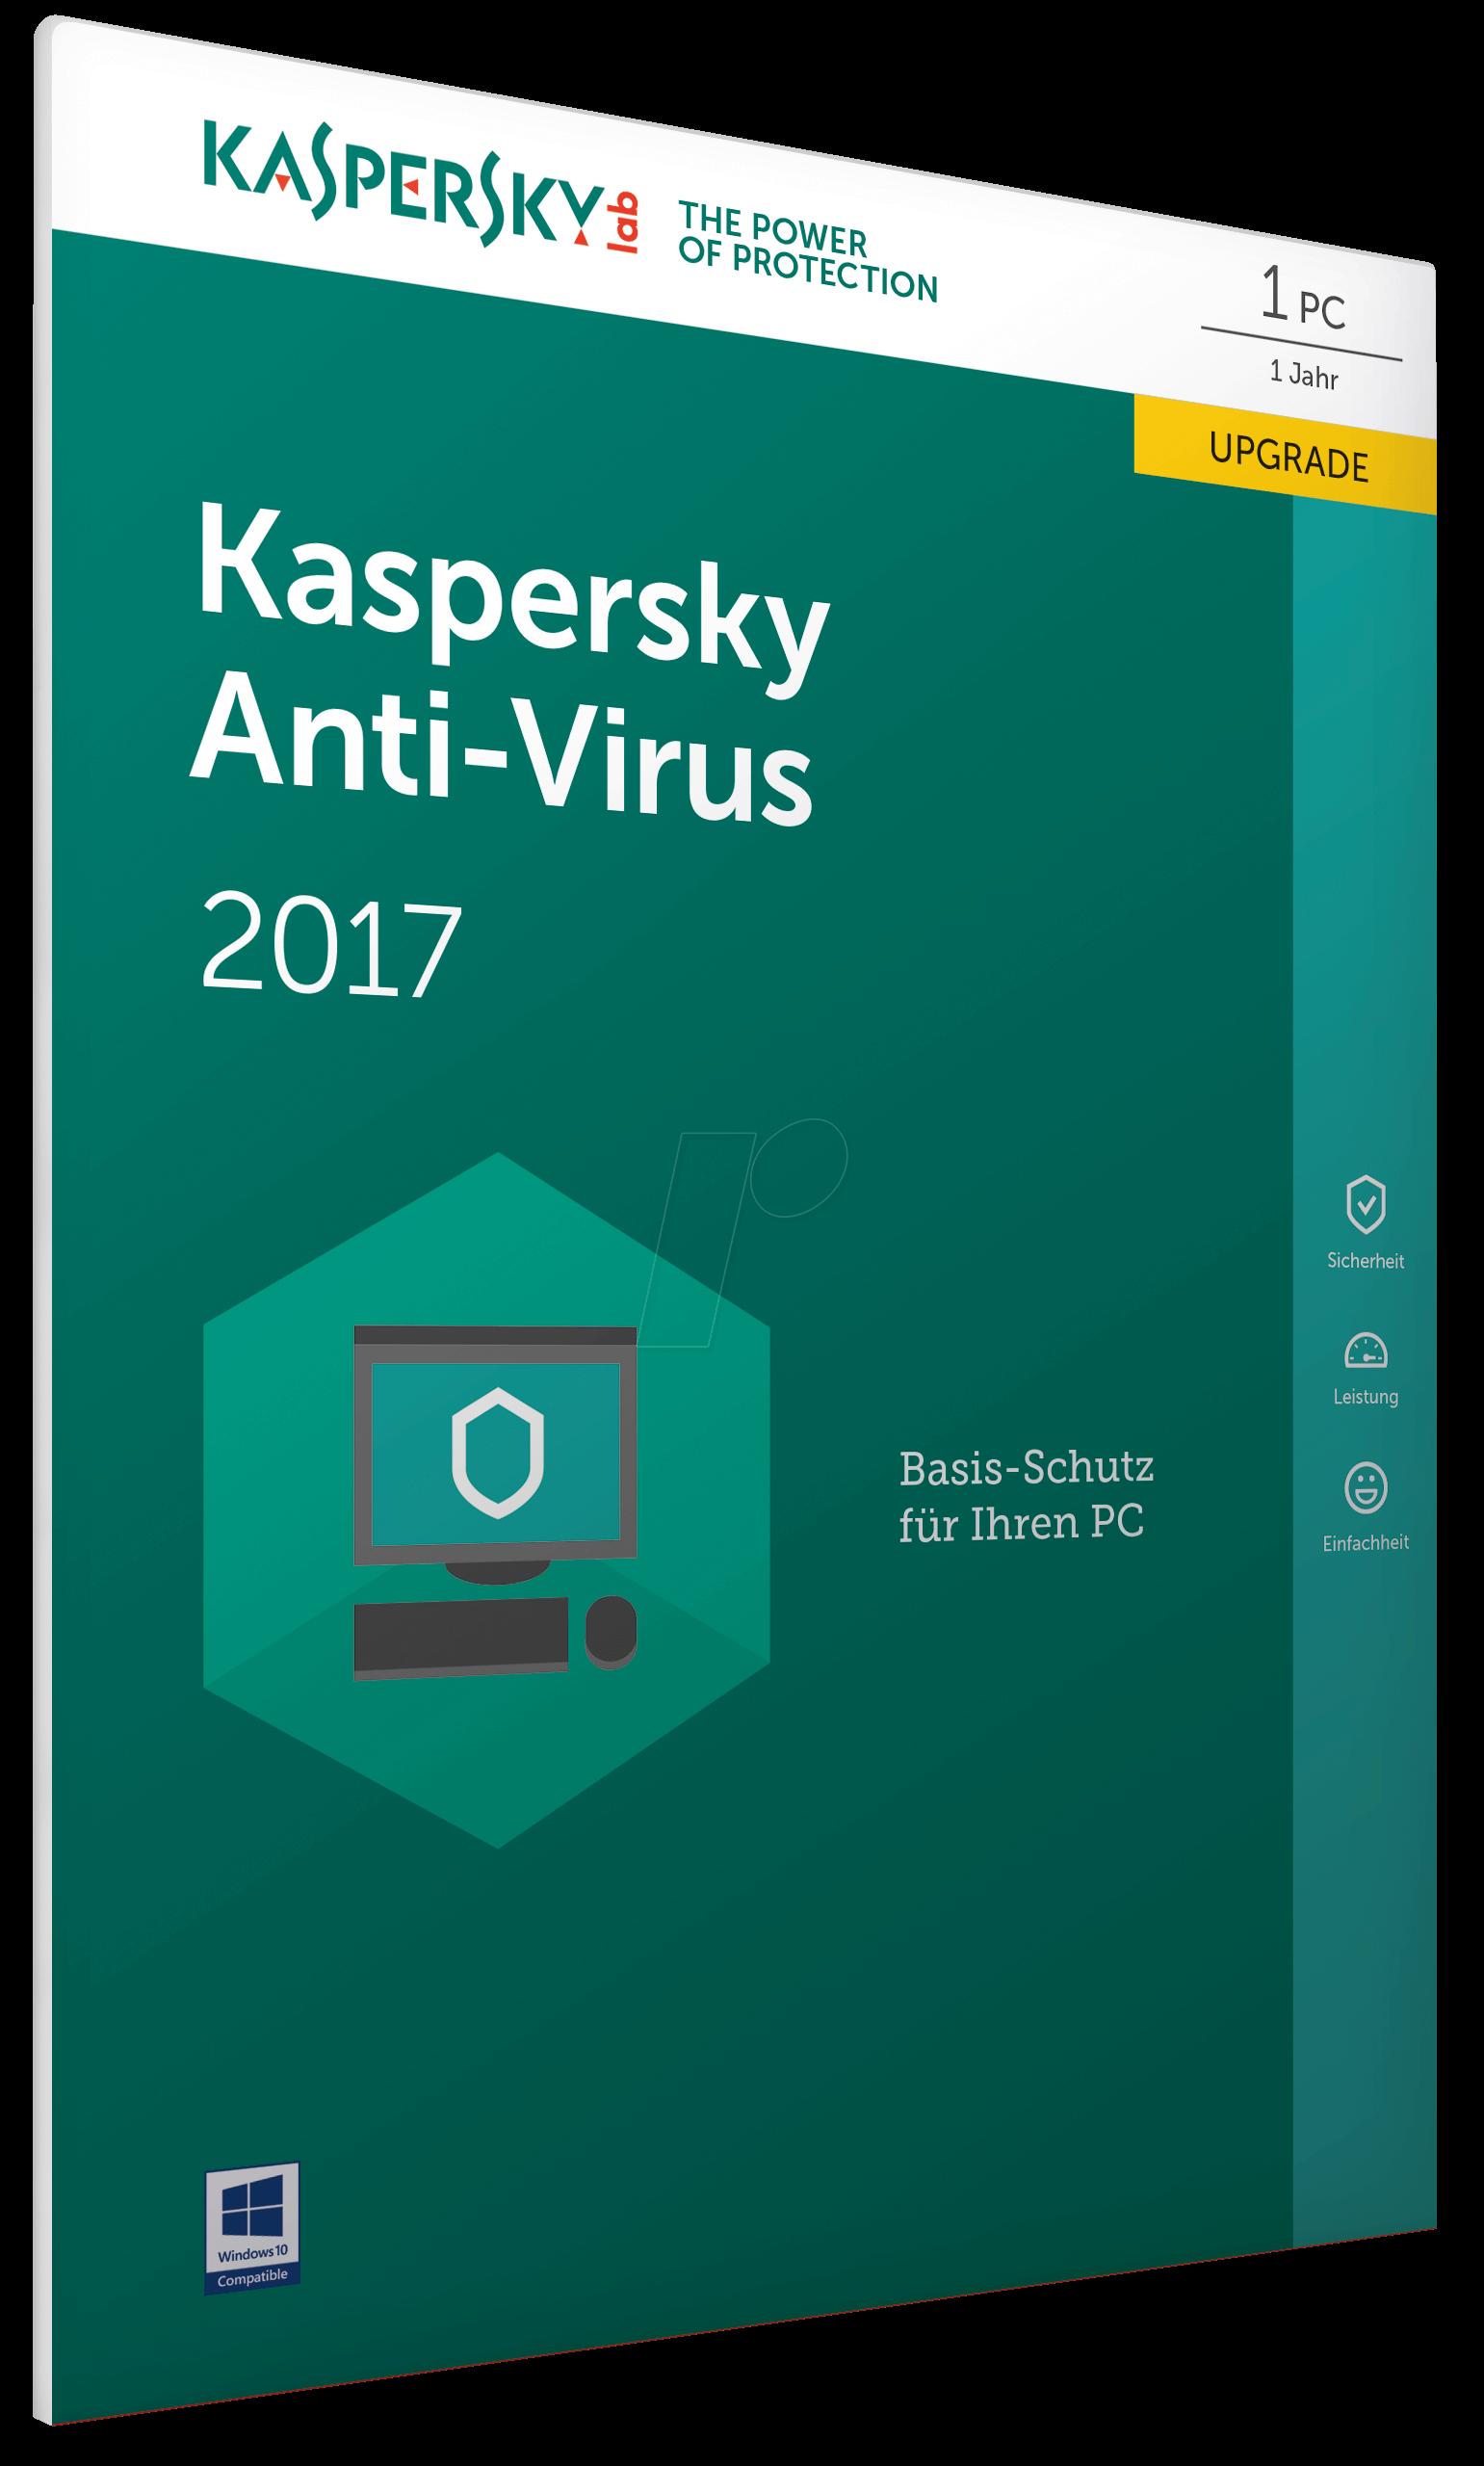 https://cdn-reichelt.de/bilder/web/xxl_ws/G500/KASPERSKY_AV2017_UPG_01.png